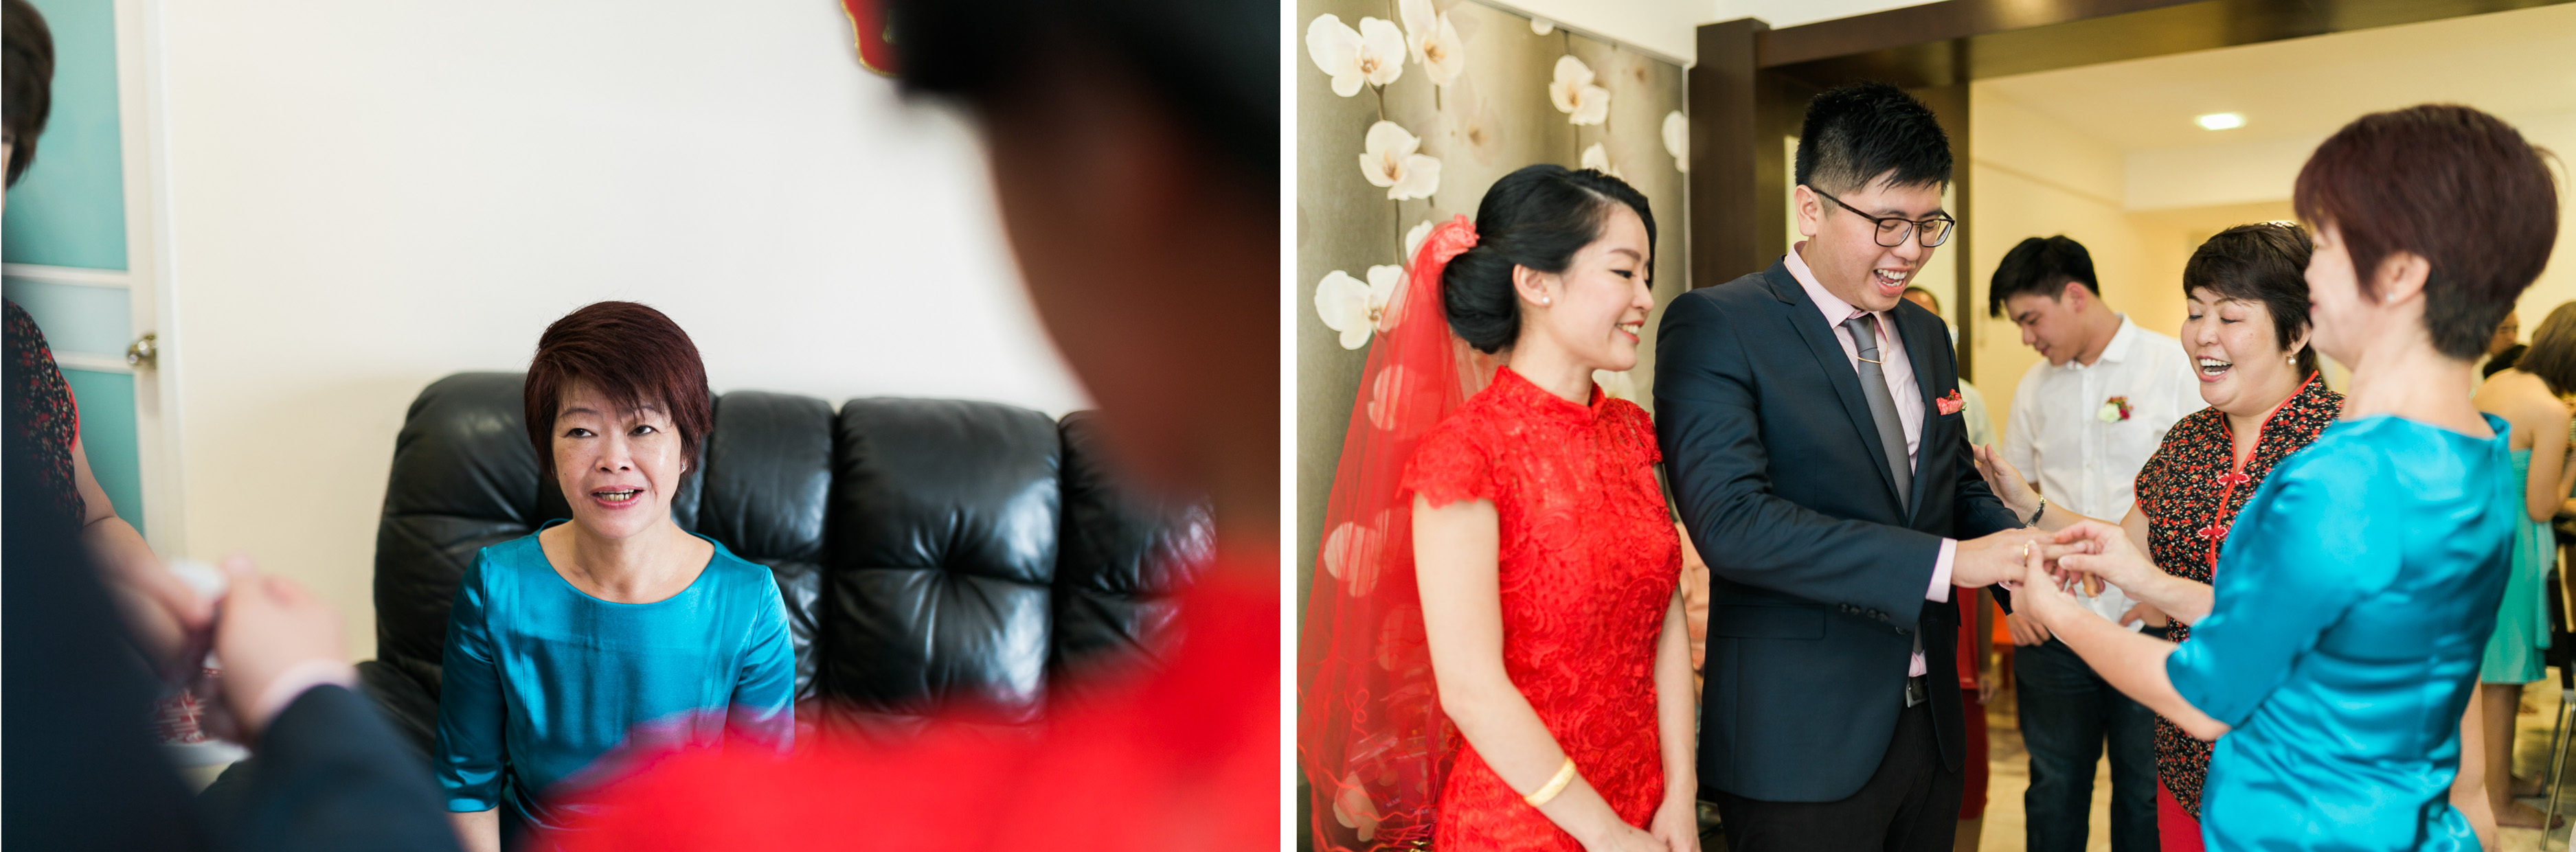 49-hellojanelee-malaysia-wedding-photographer-lake-garden-tinajackson-prewedding